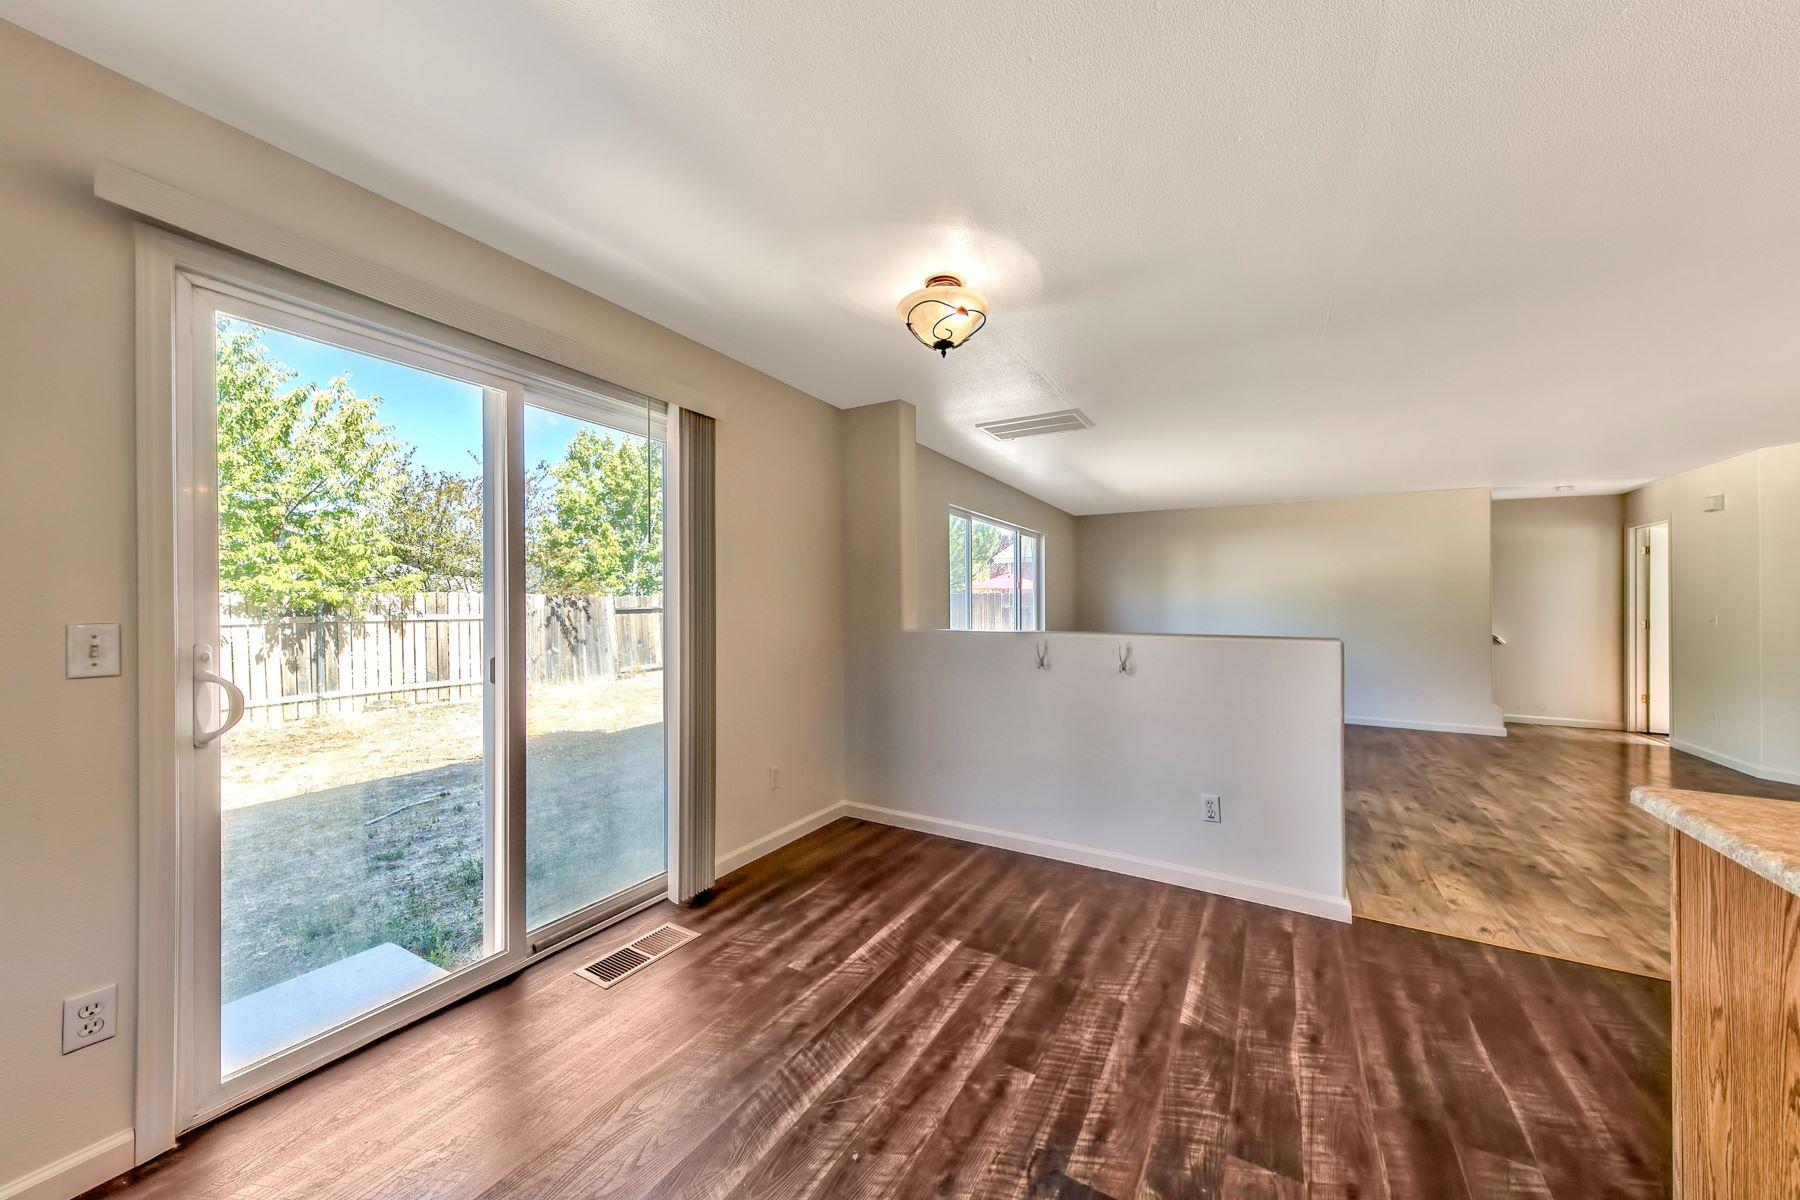 Additional photo for property listing at 7475 Hinton Drive, Reno 7475 Hinton Drive Reno, Nevada 89506 United States